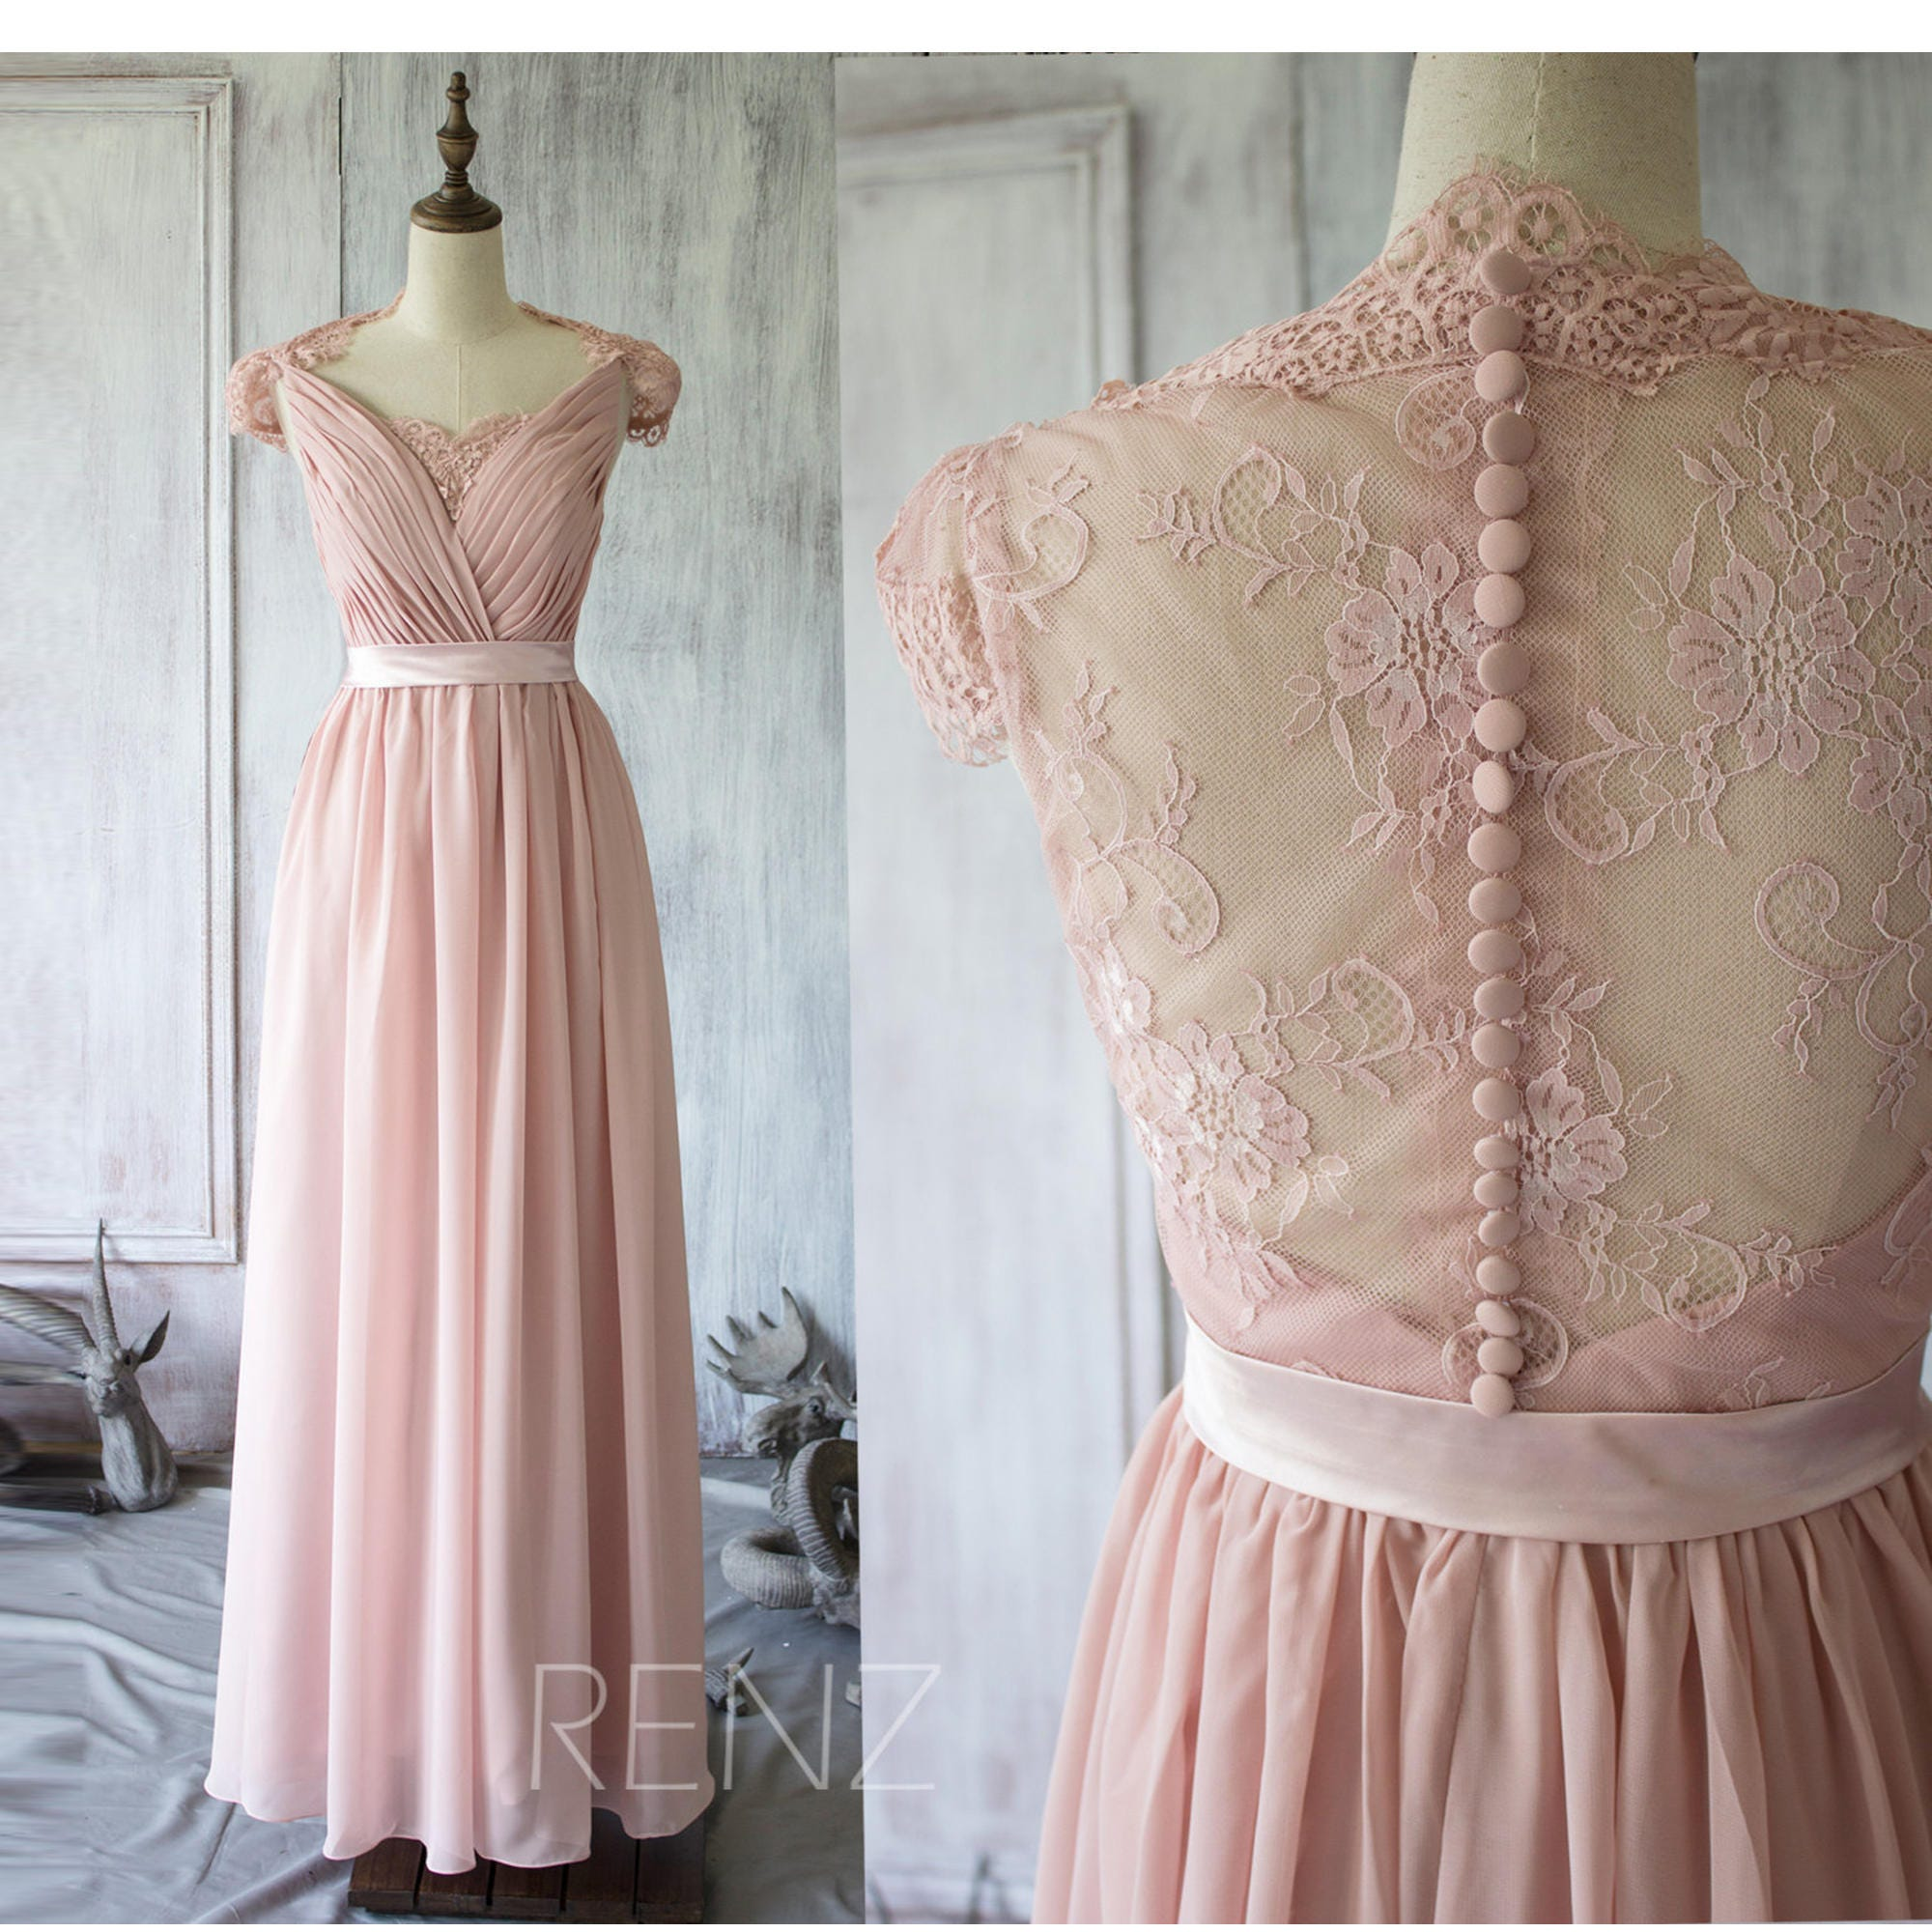 Blush chiffon lace bridesmaid dress cap sleeve wedding dress zoom ombrellifo Images